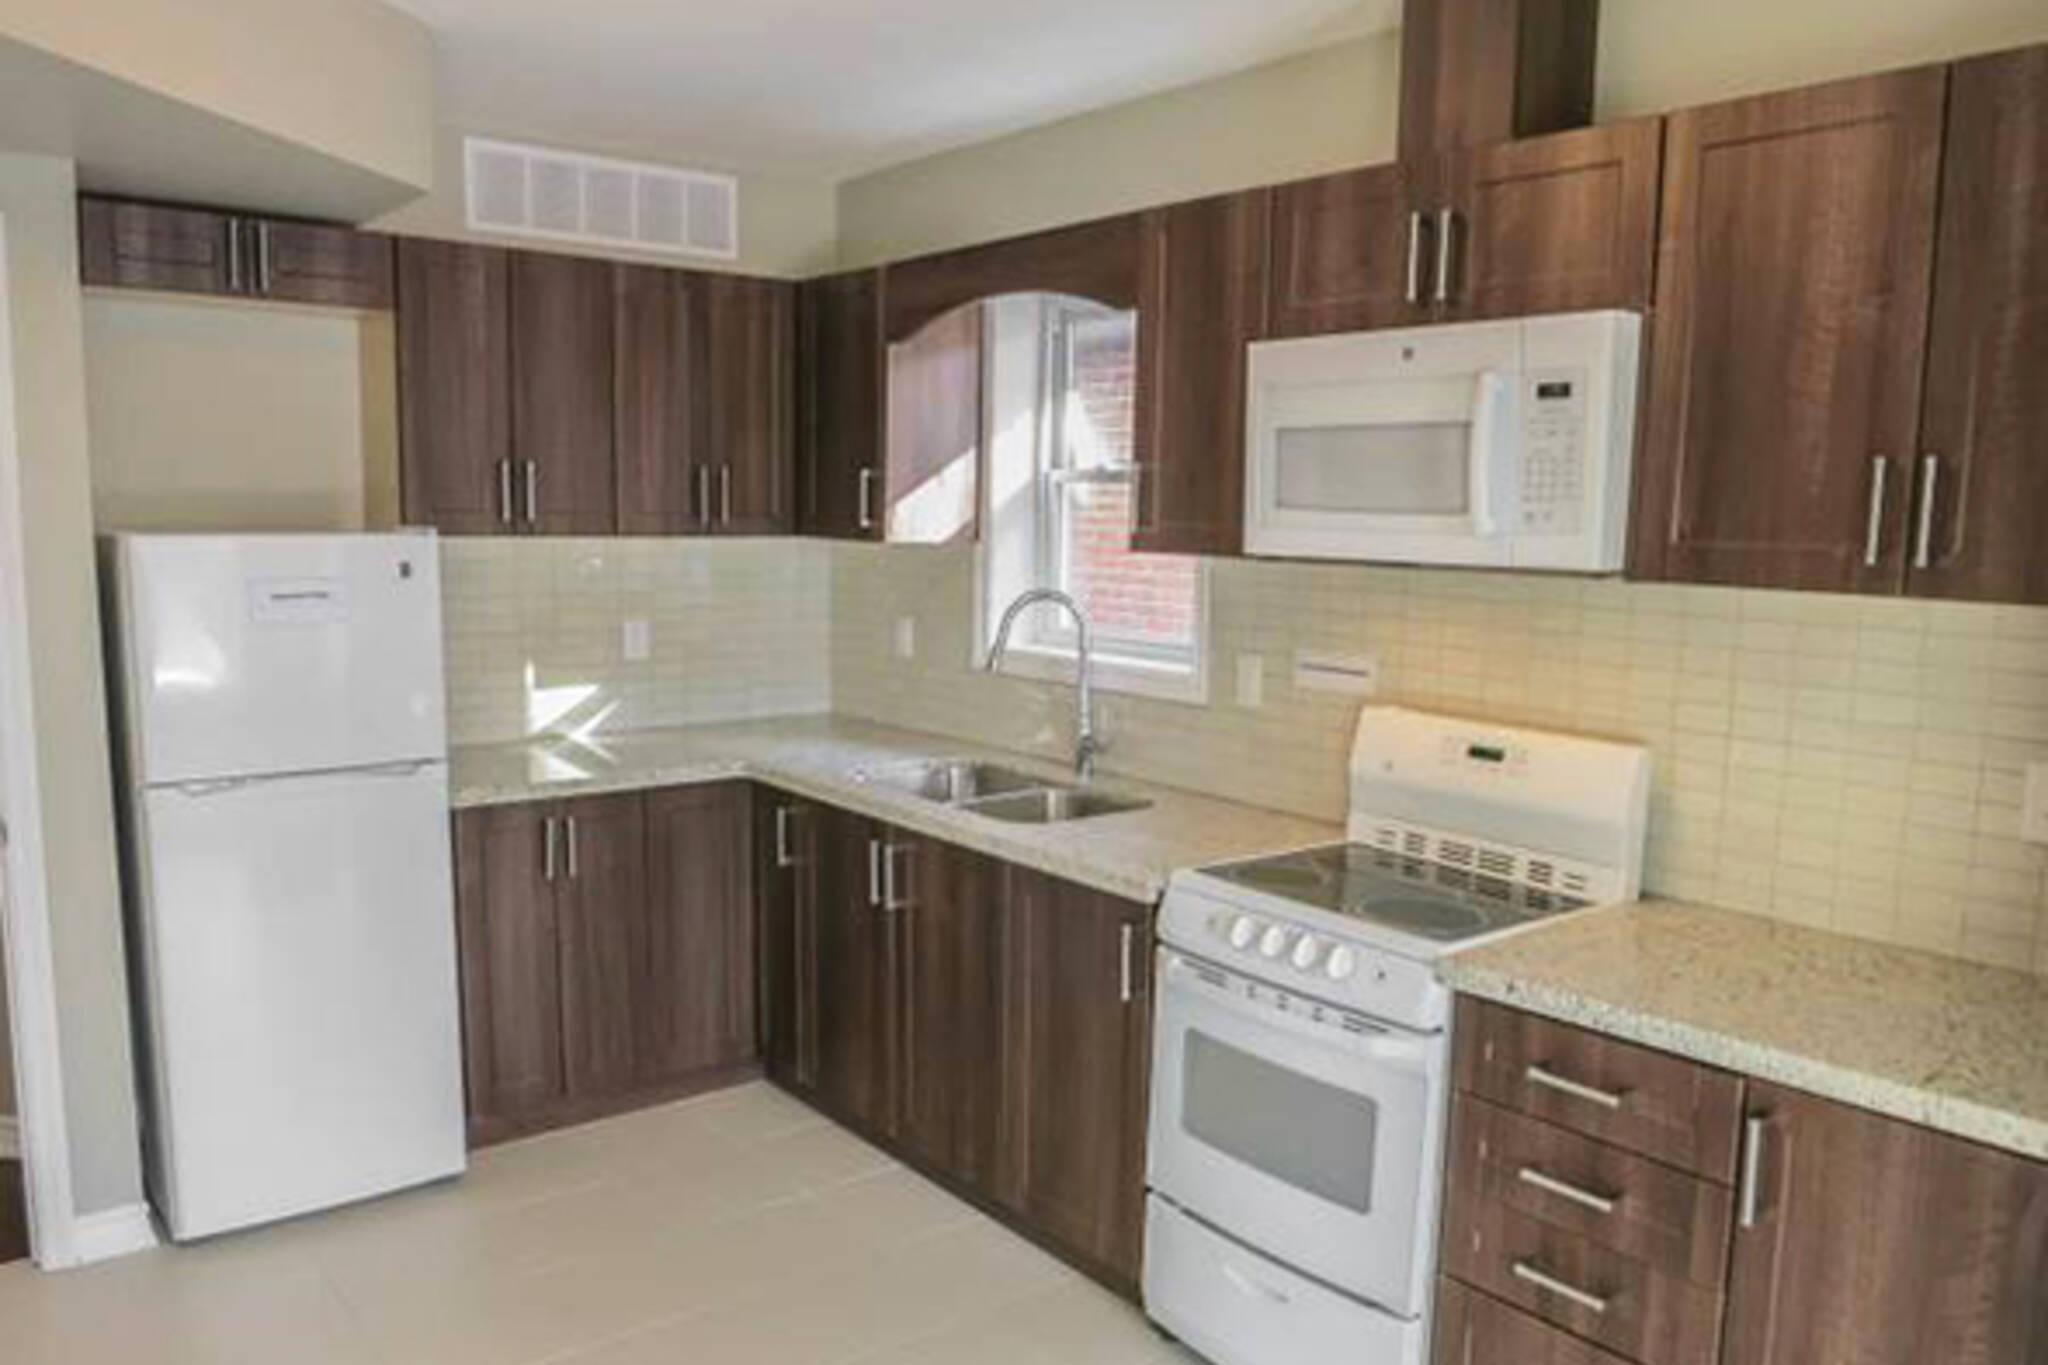 1500 dollar apartment toronto